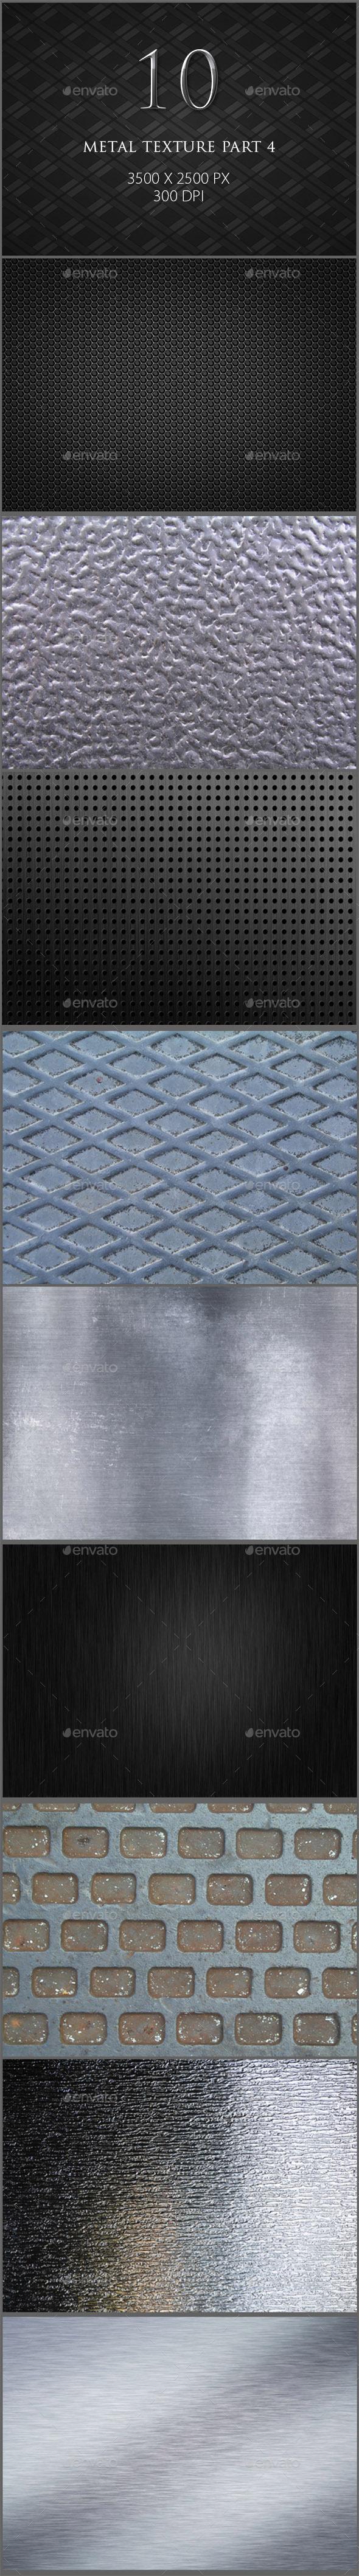 10 Metal Texture Part 4 - Metal Textures